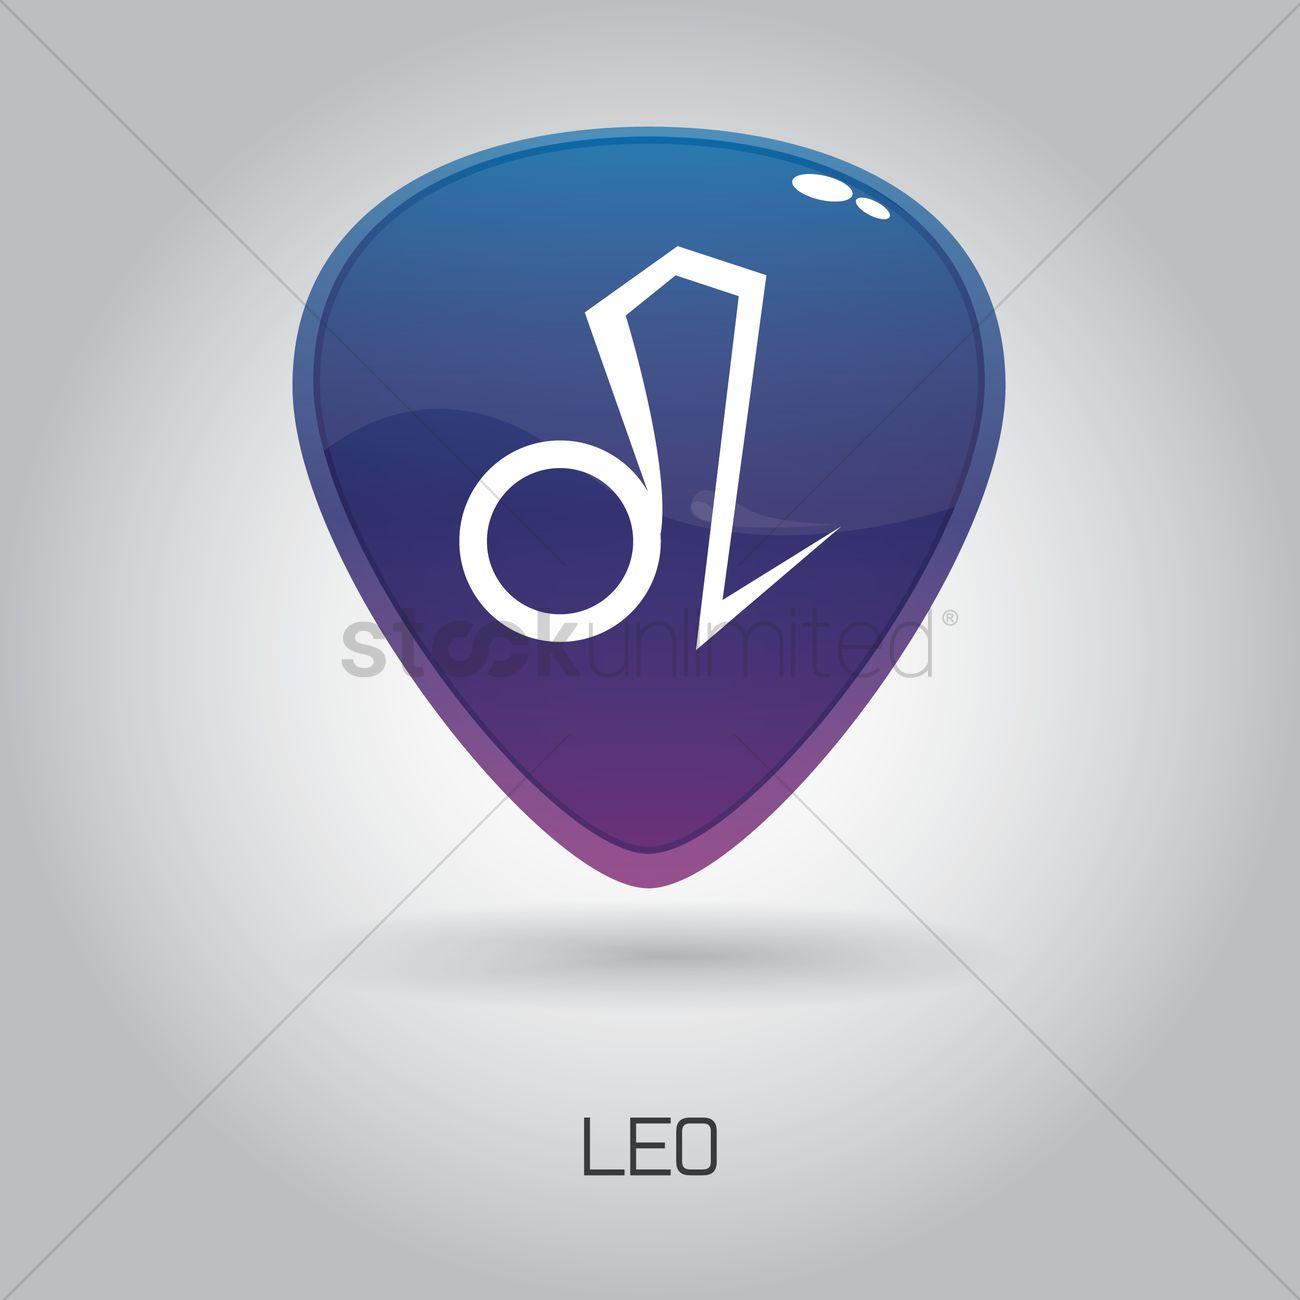 Sketchy Zodiac Leo Symbol Vector Image 1414444 Stockunlimited